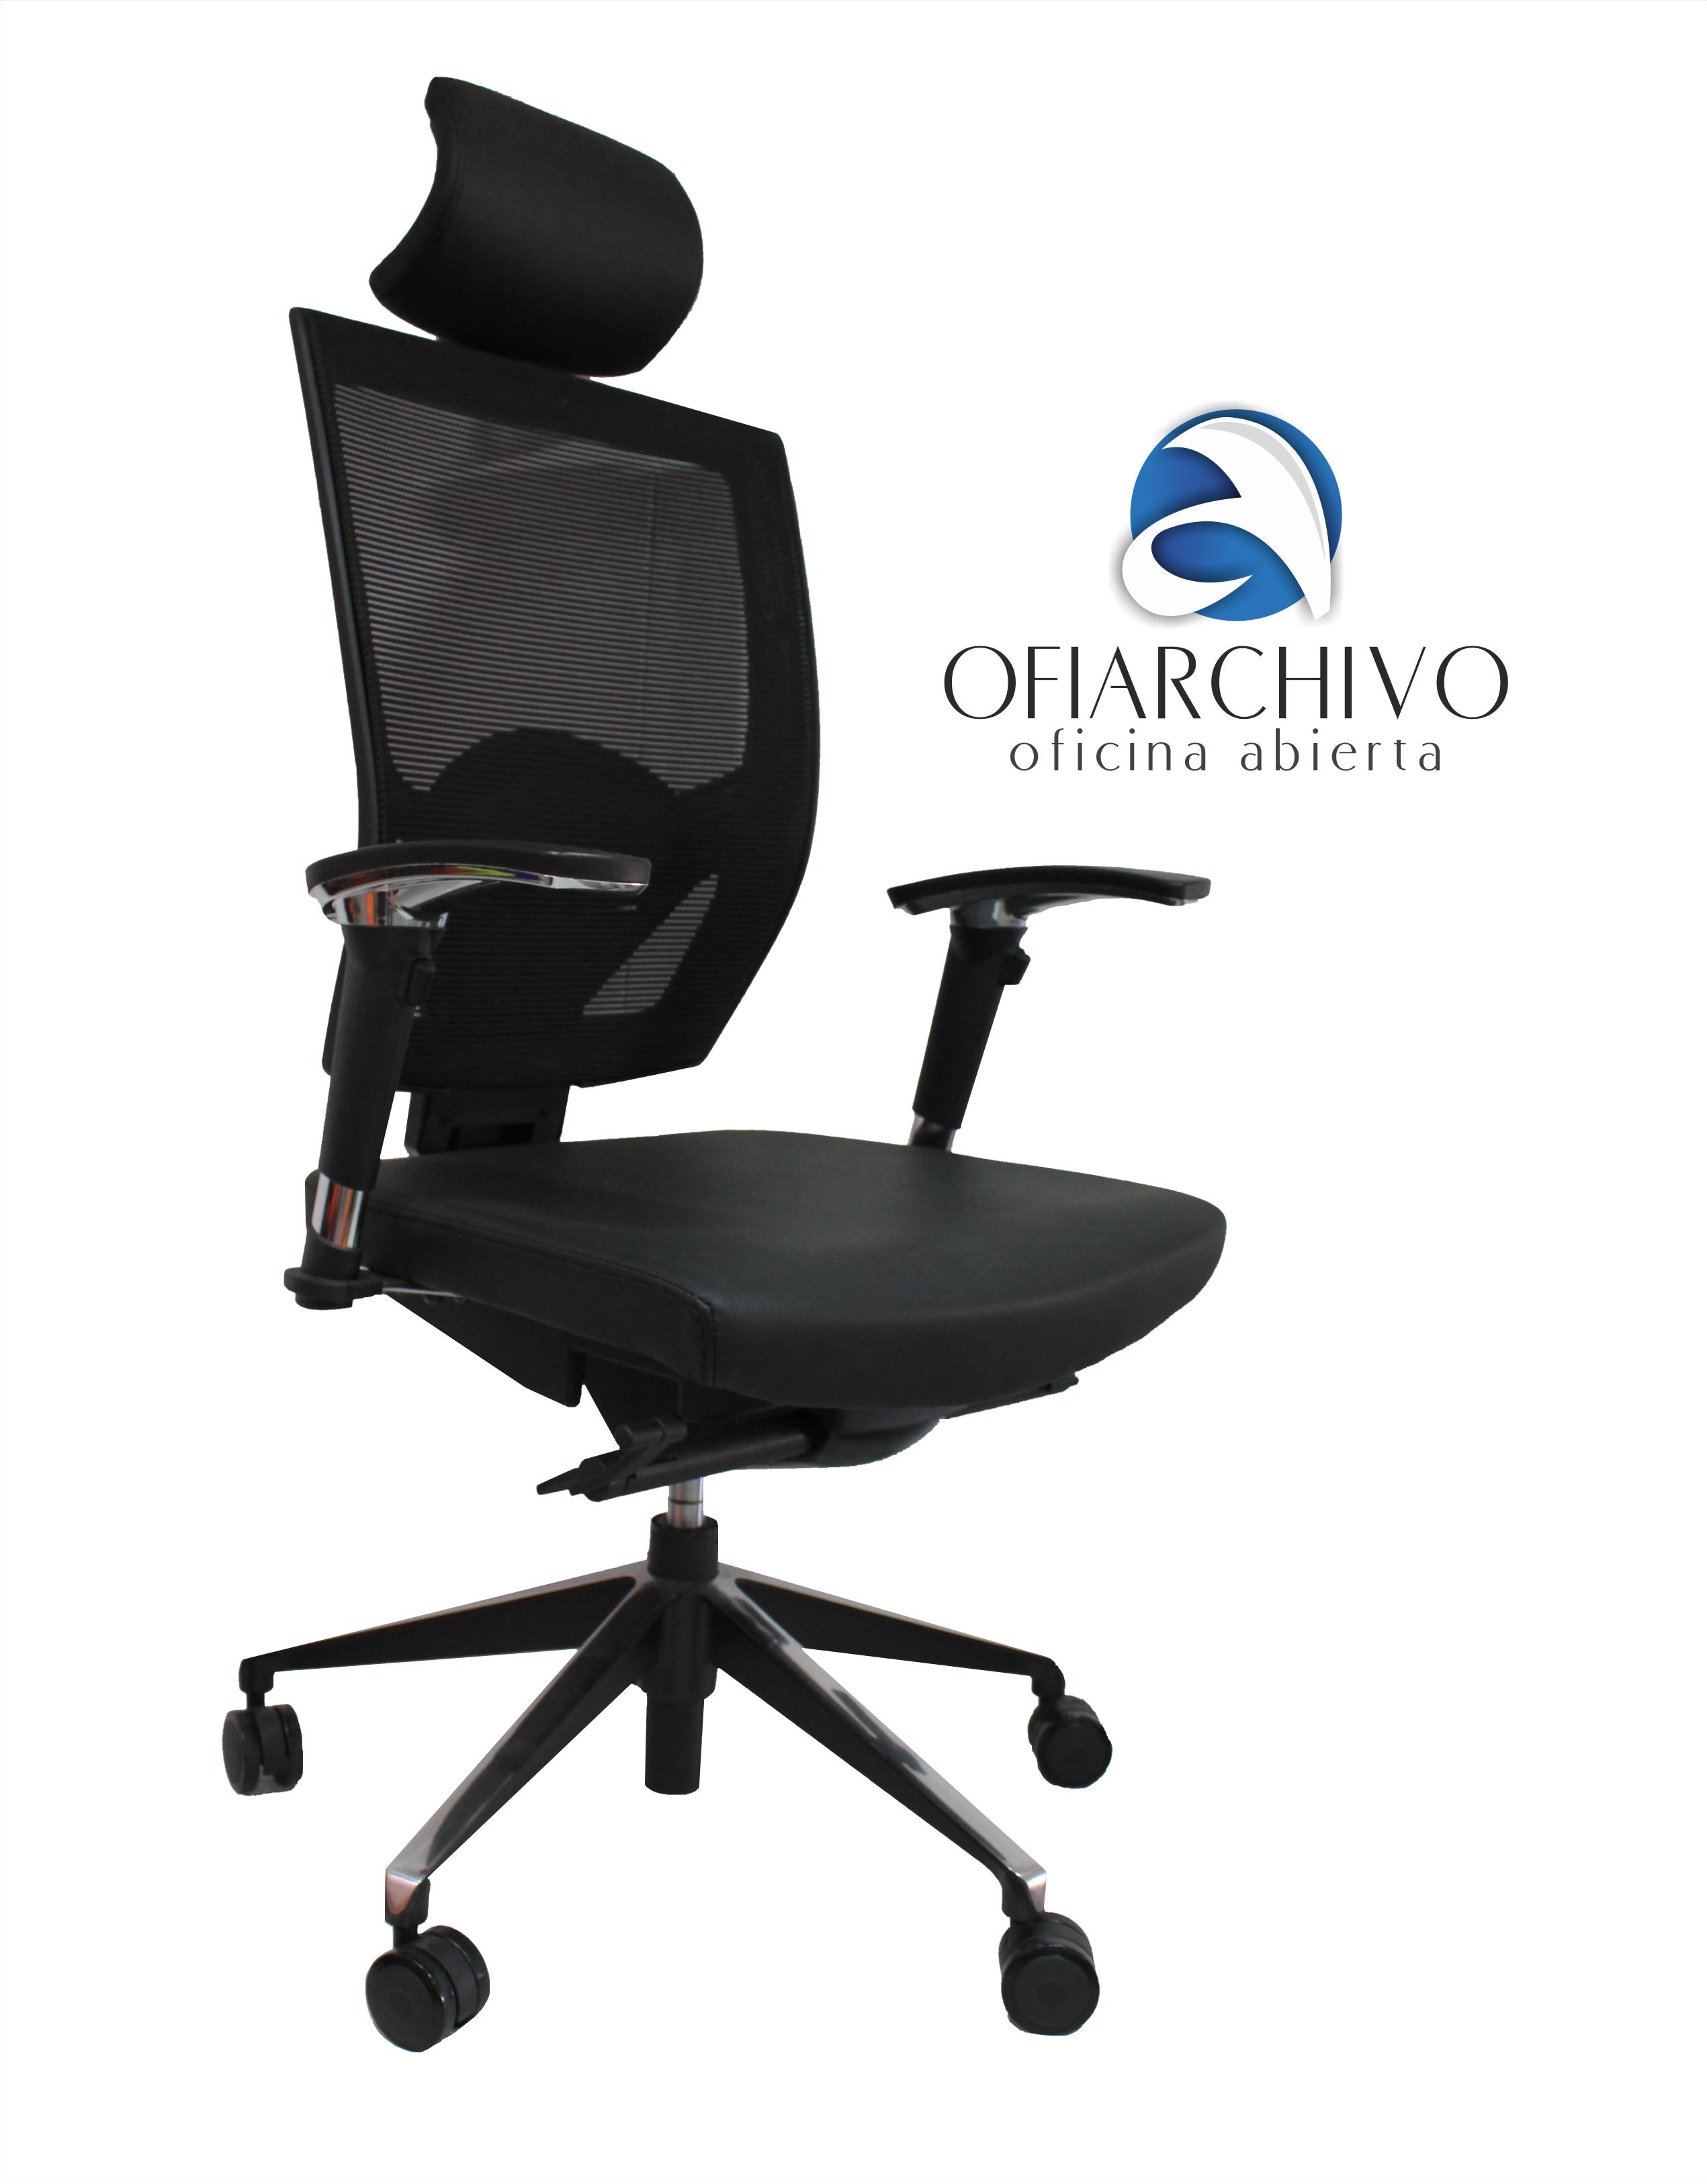 president office chair black. Silla Presidente Ofiarchivo - NEGRO President Office Chair Black